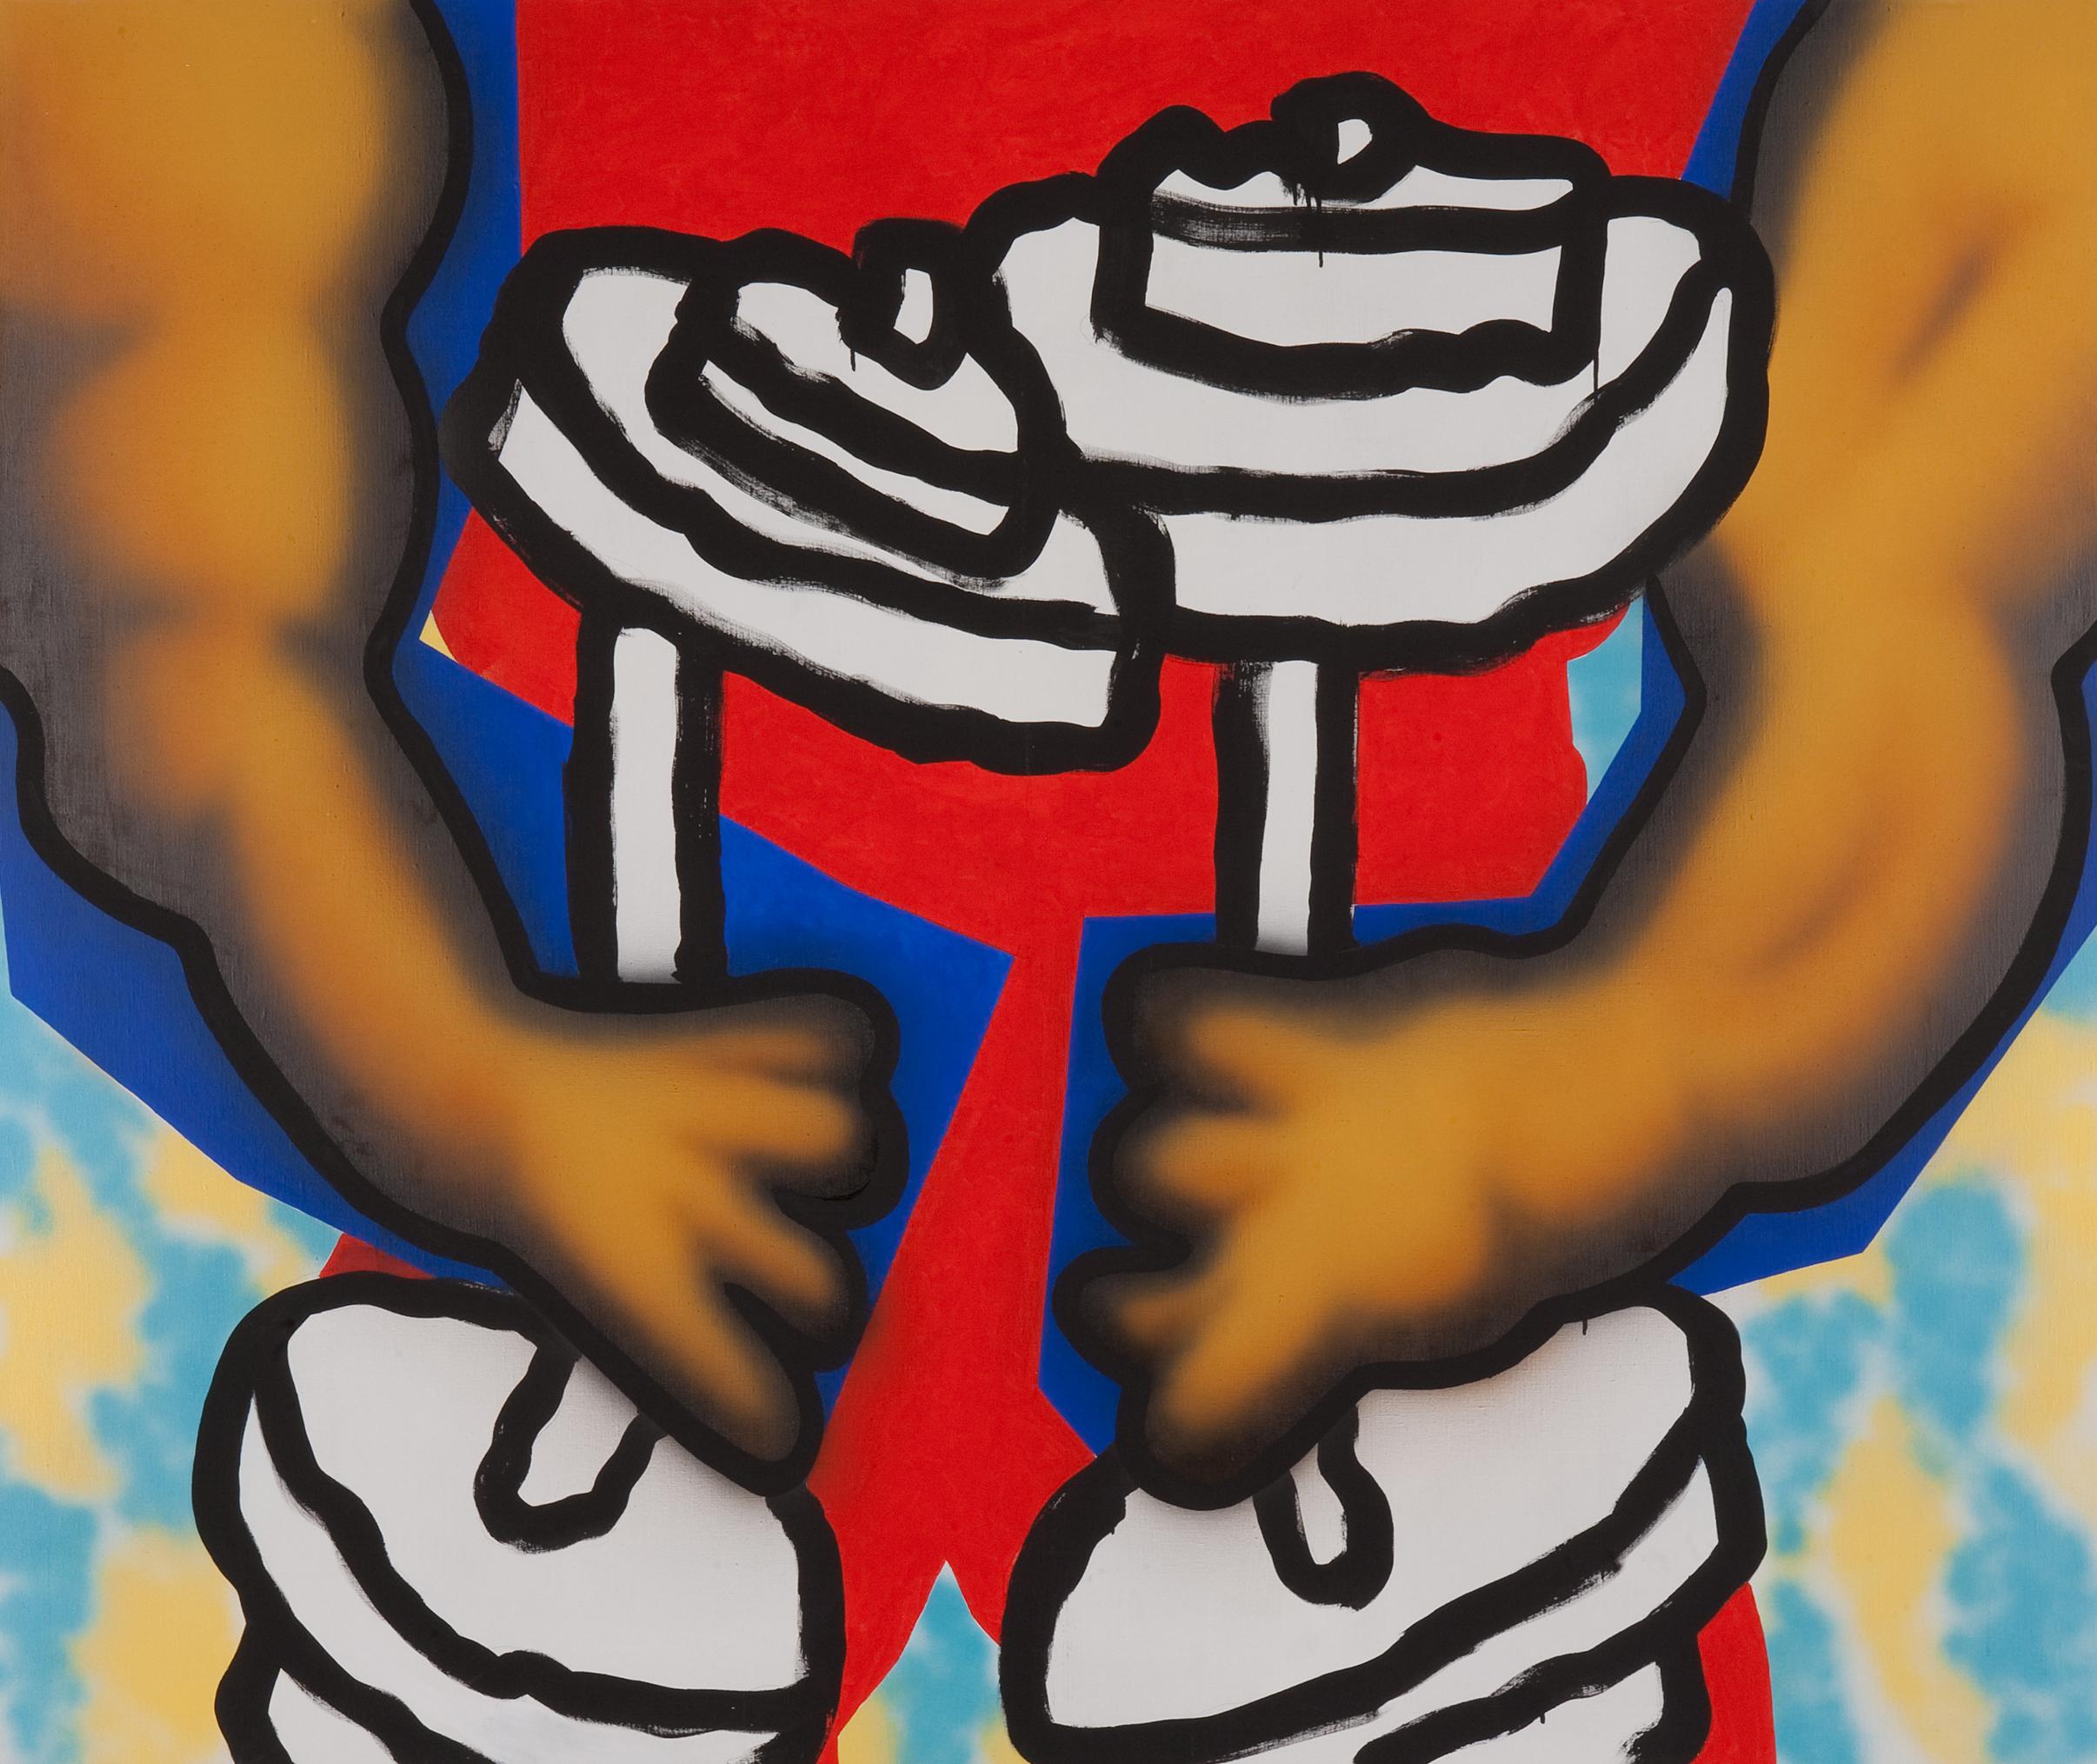 Tribulus Terestis, 2008, acrylic, spray on canvas, 170 x 200 cm